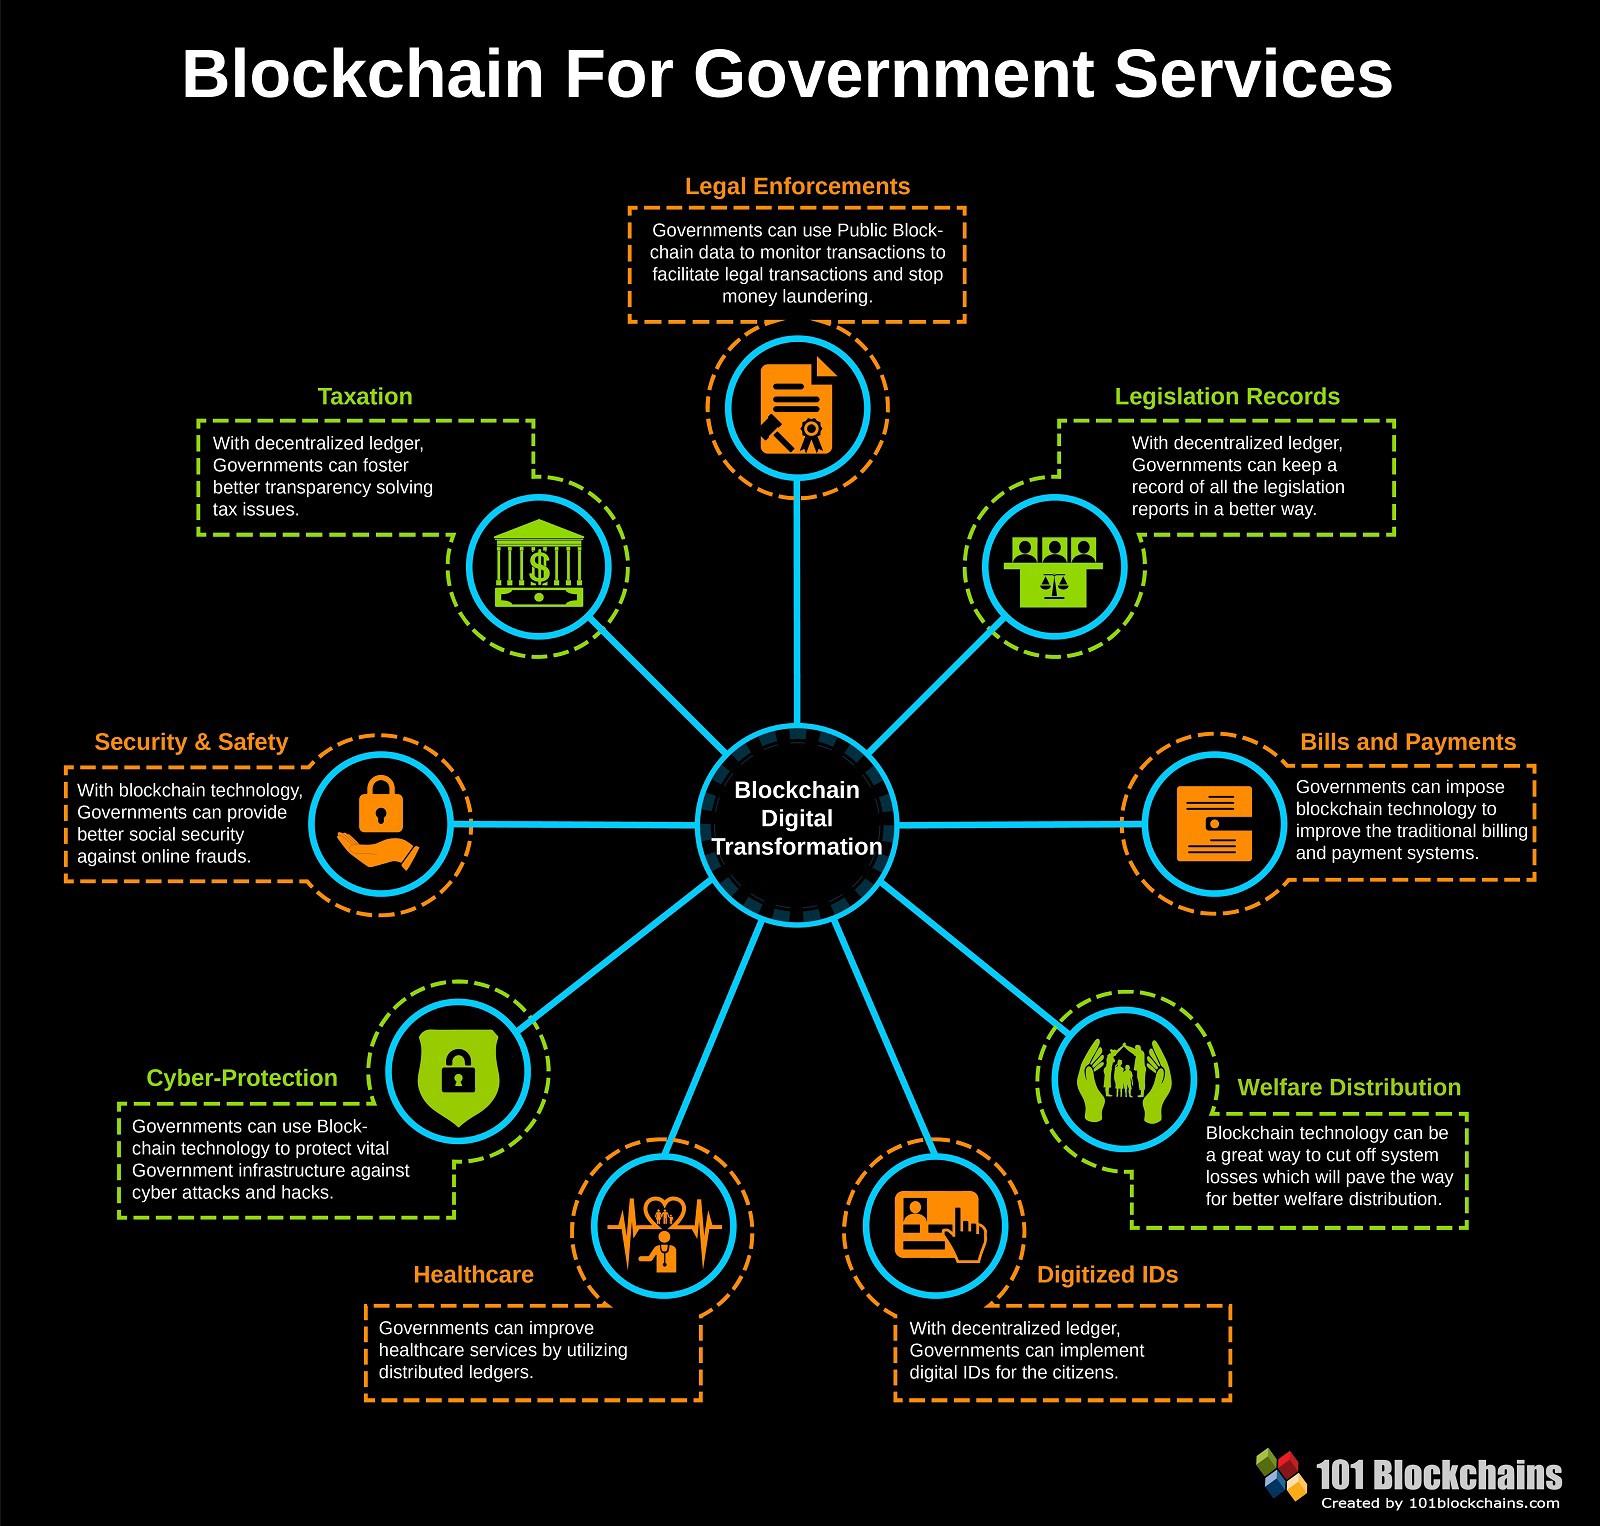 /blockchain-education-as-a-key-factor-to-economic-growth-274cc3d200d5 feature image